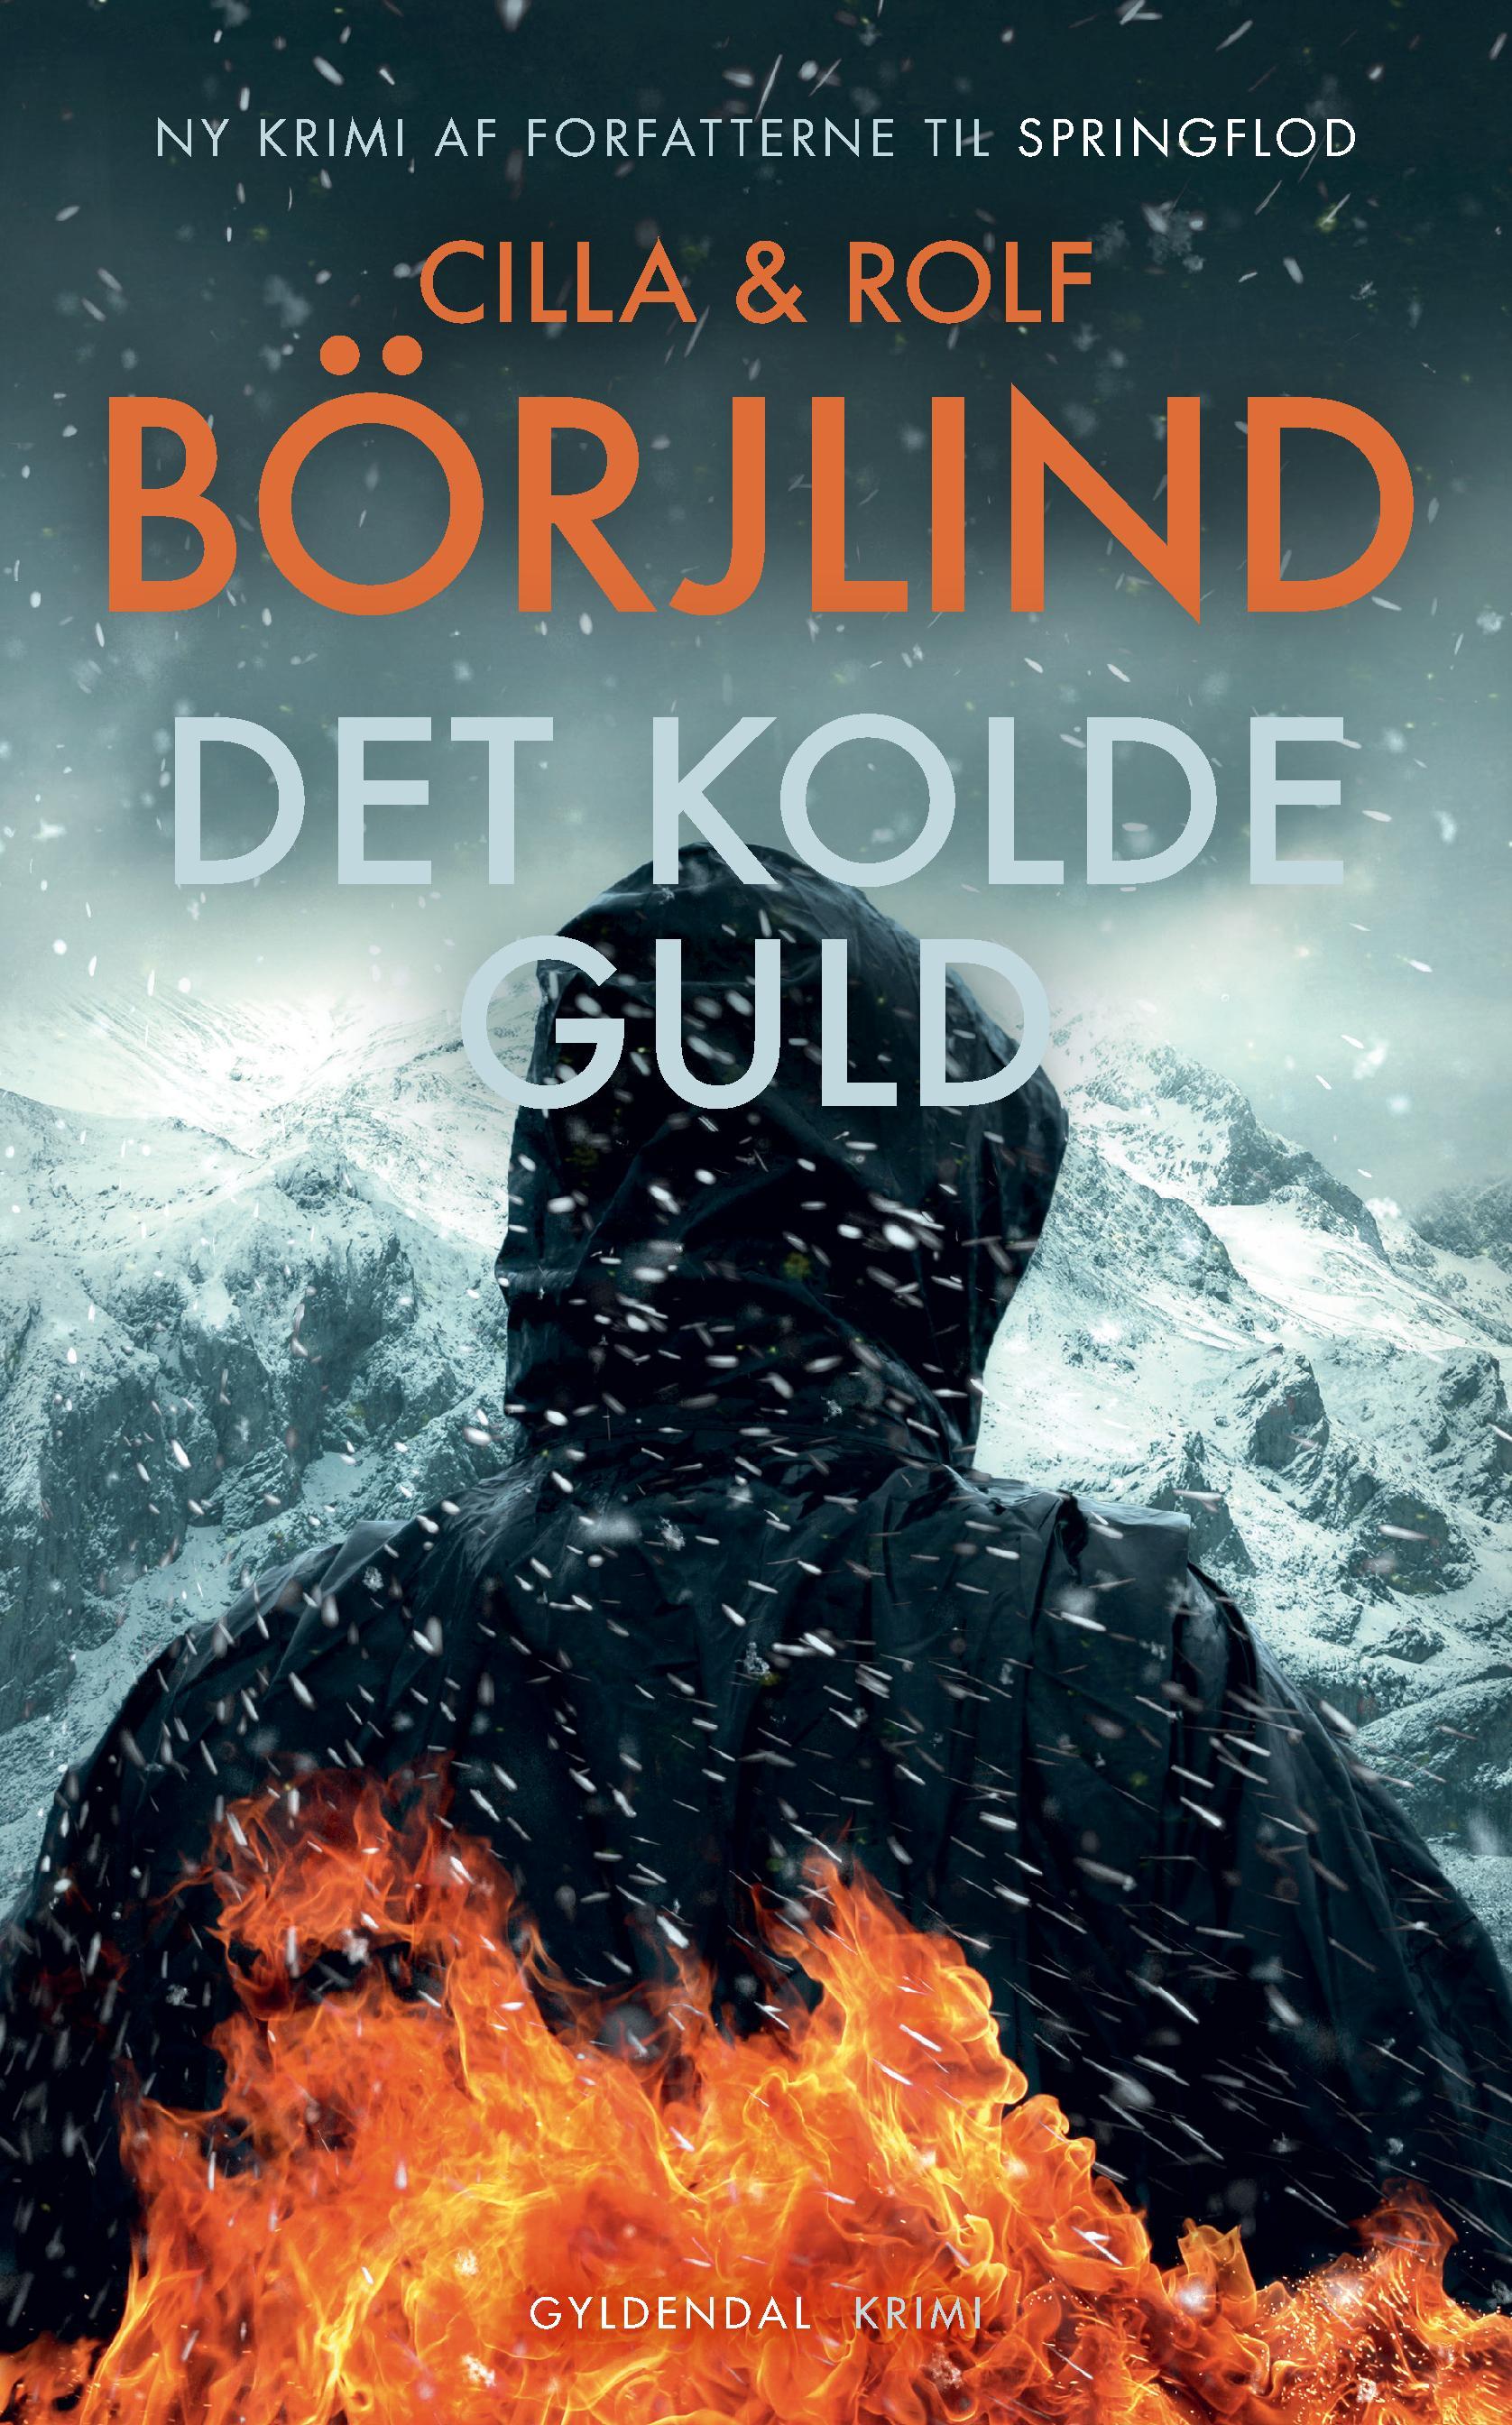 Rönning & Stilton: Det kolde guld - Cilla og Rolf Börjlind - Bøger - Gyldendal - 9788763865906 - 5/2-2021